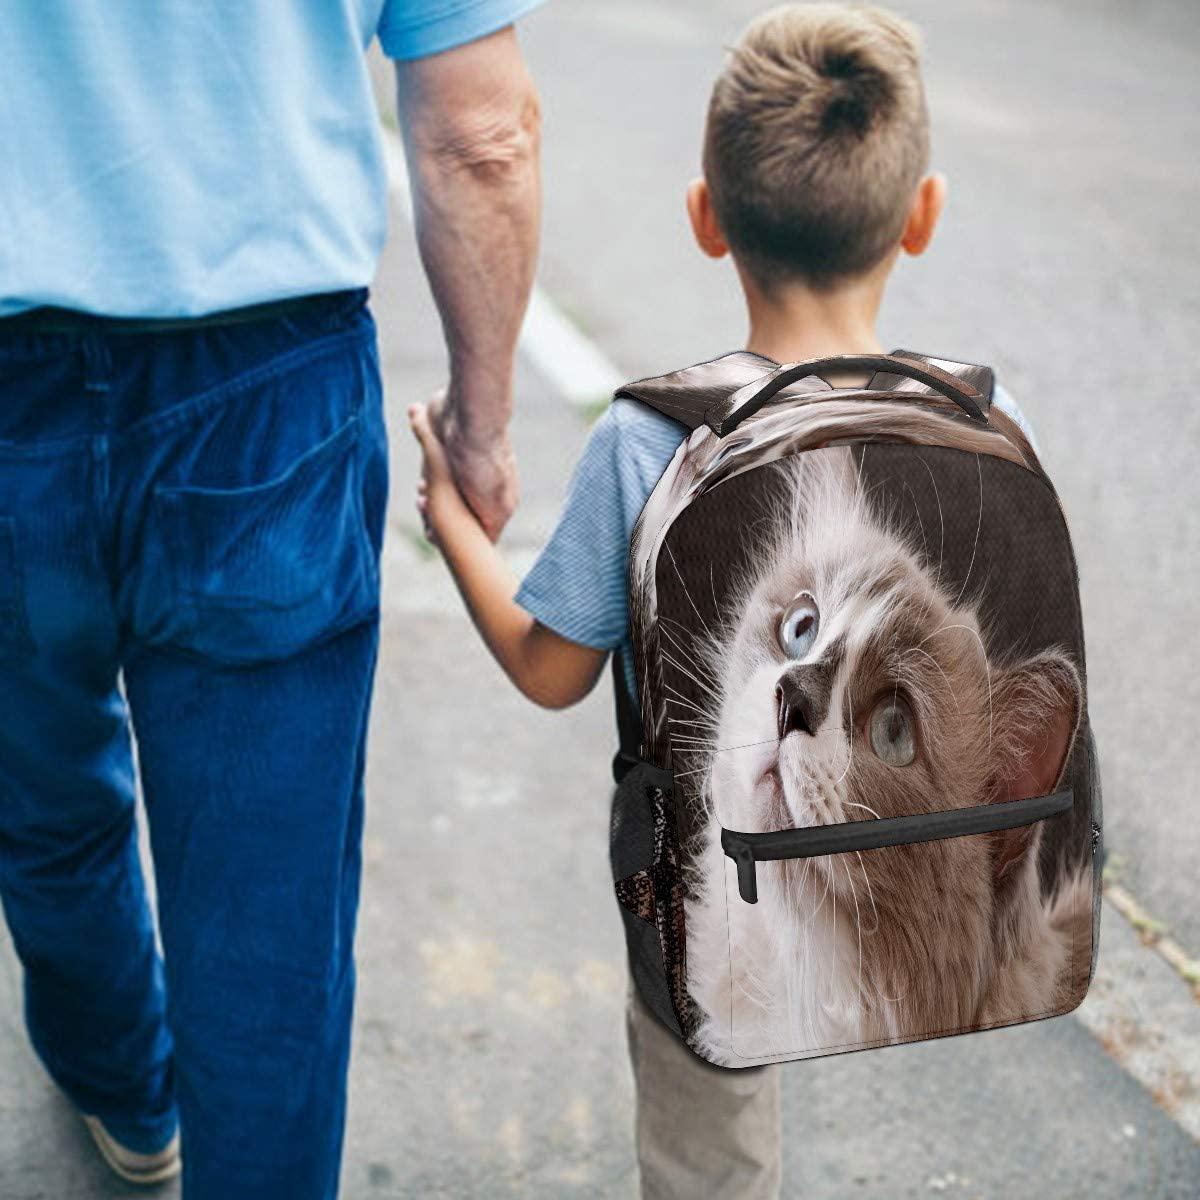 Ragdoll Breed Cat Face Backpack for Kids Girls Boys Teen Elementary School Children Bookbag Camping Daypack Purse Laptop Bag Tote multfunction Pocket with Wide Shoulder Straps